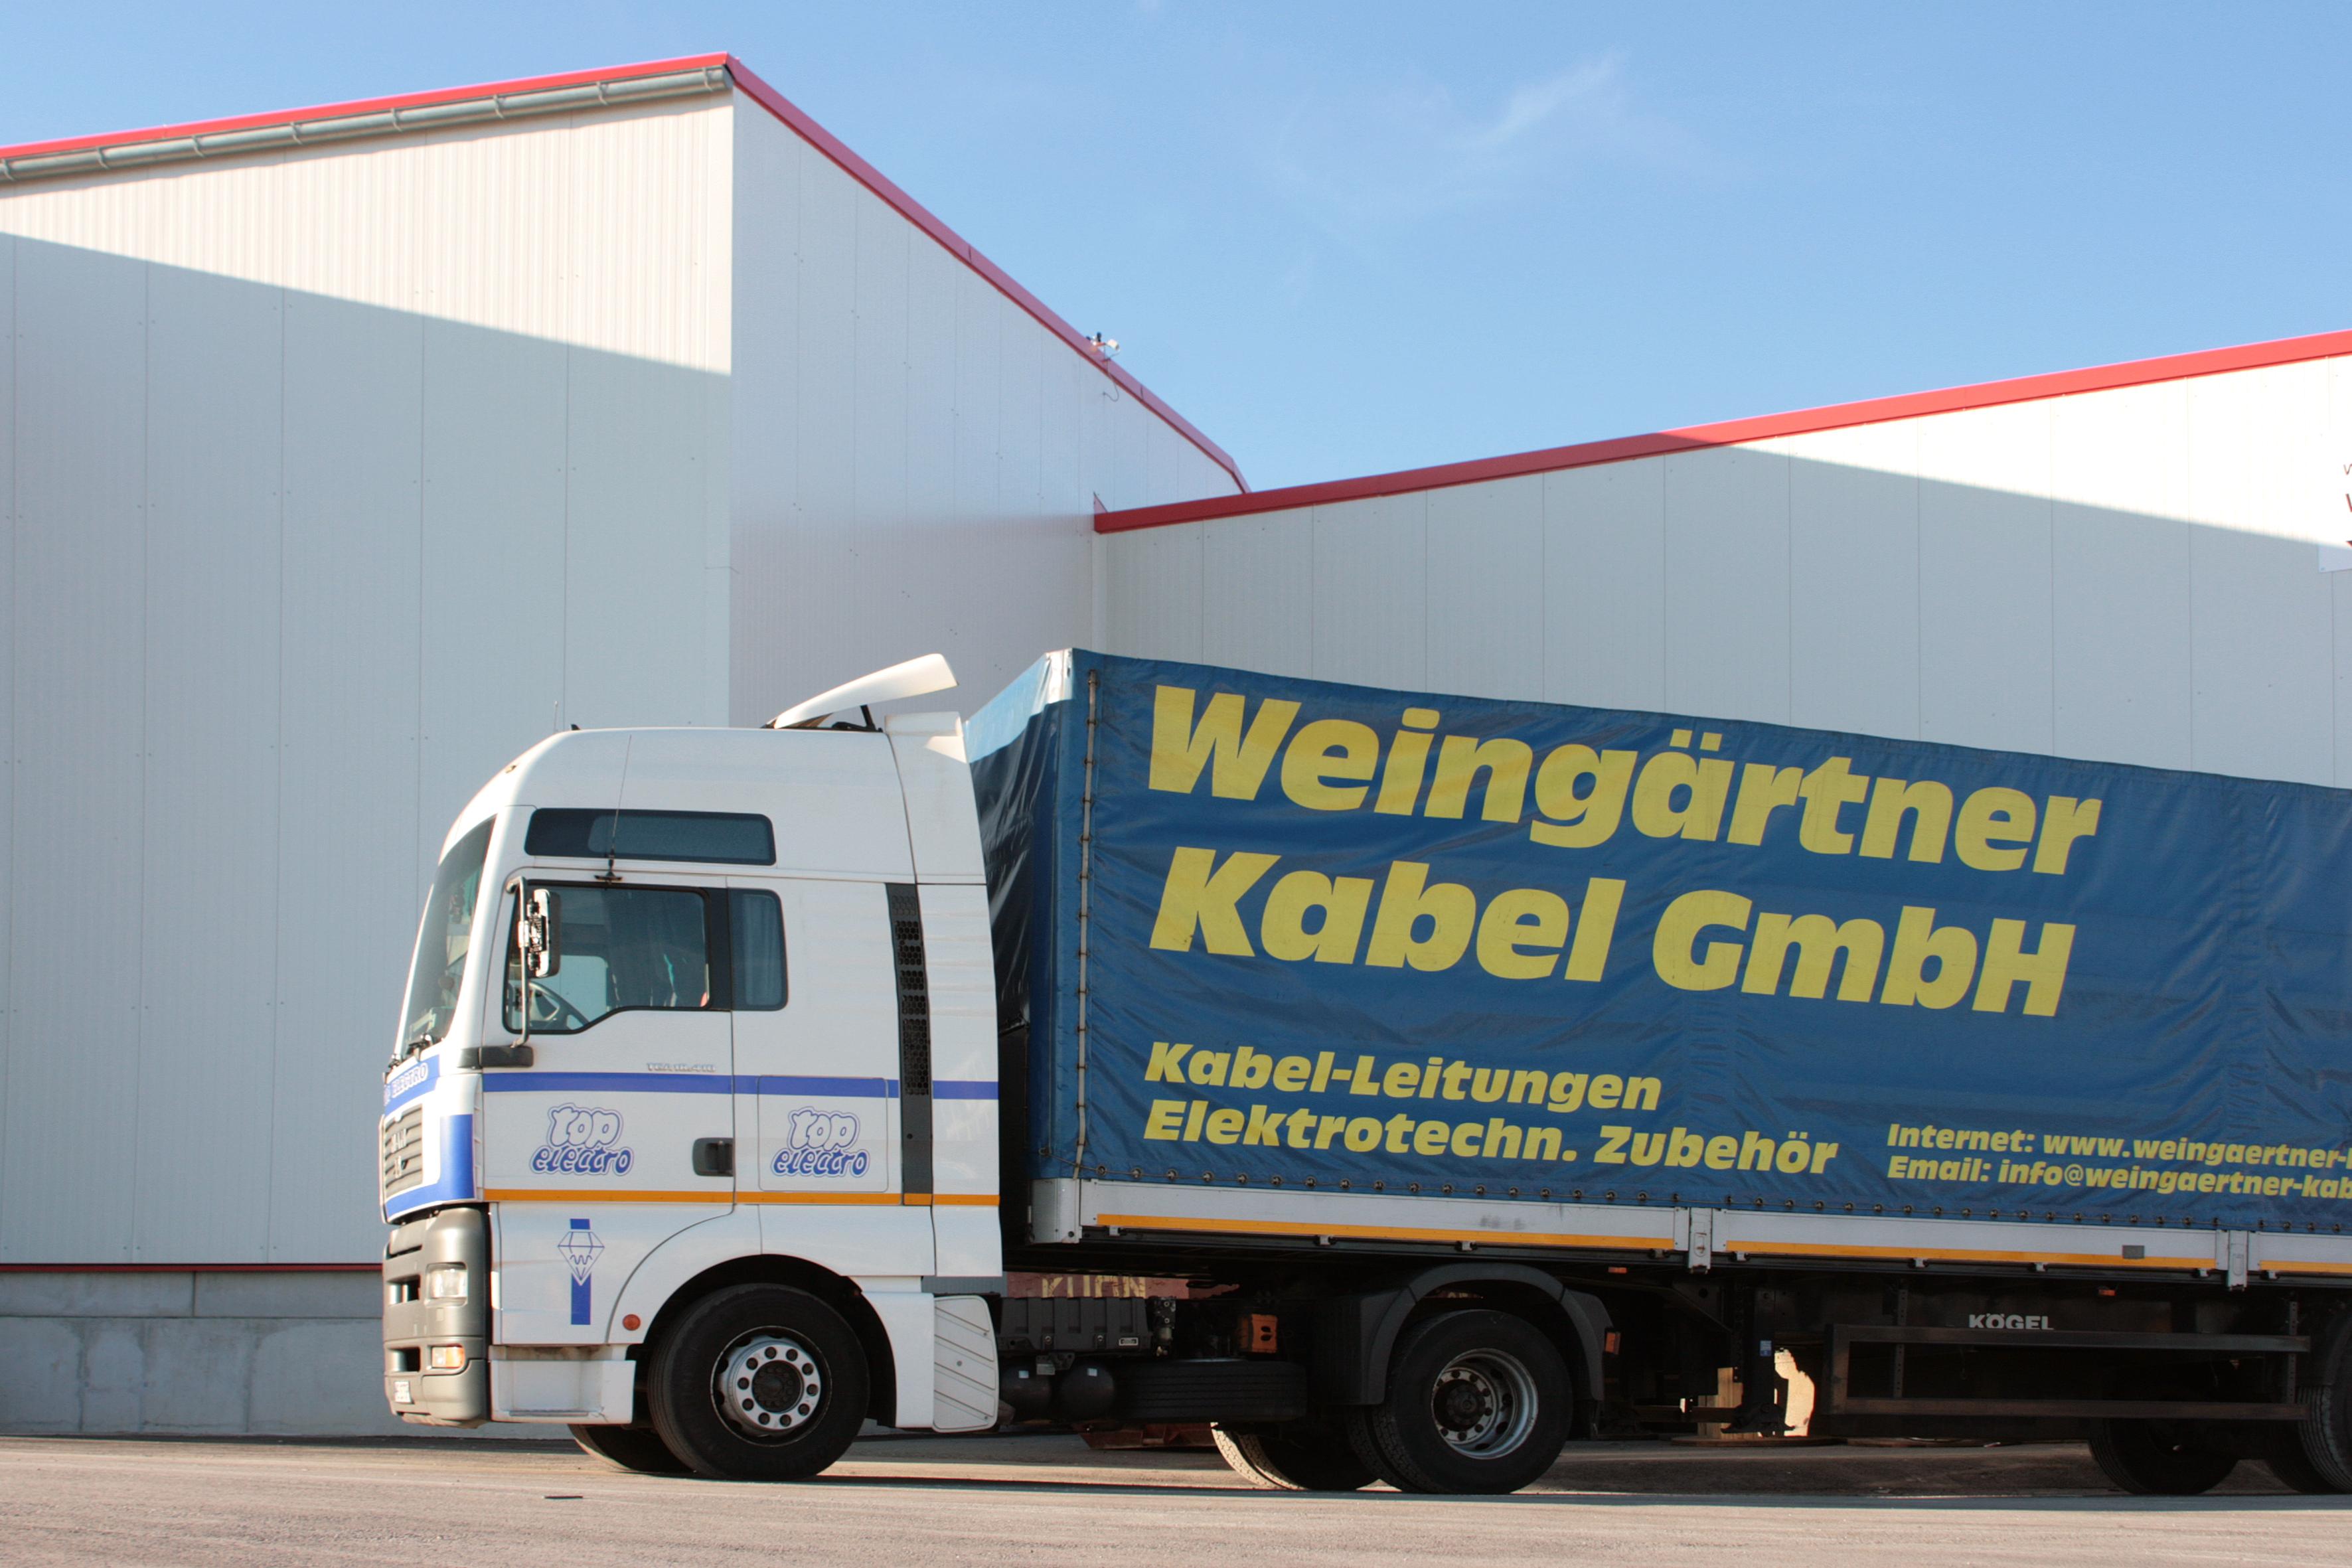 Weingärtner Kabel GmbH